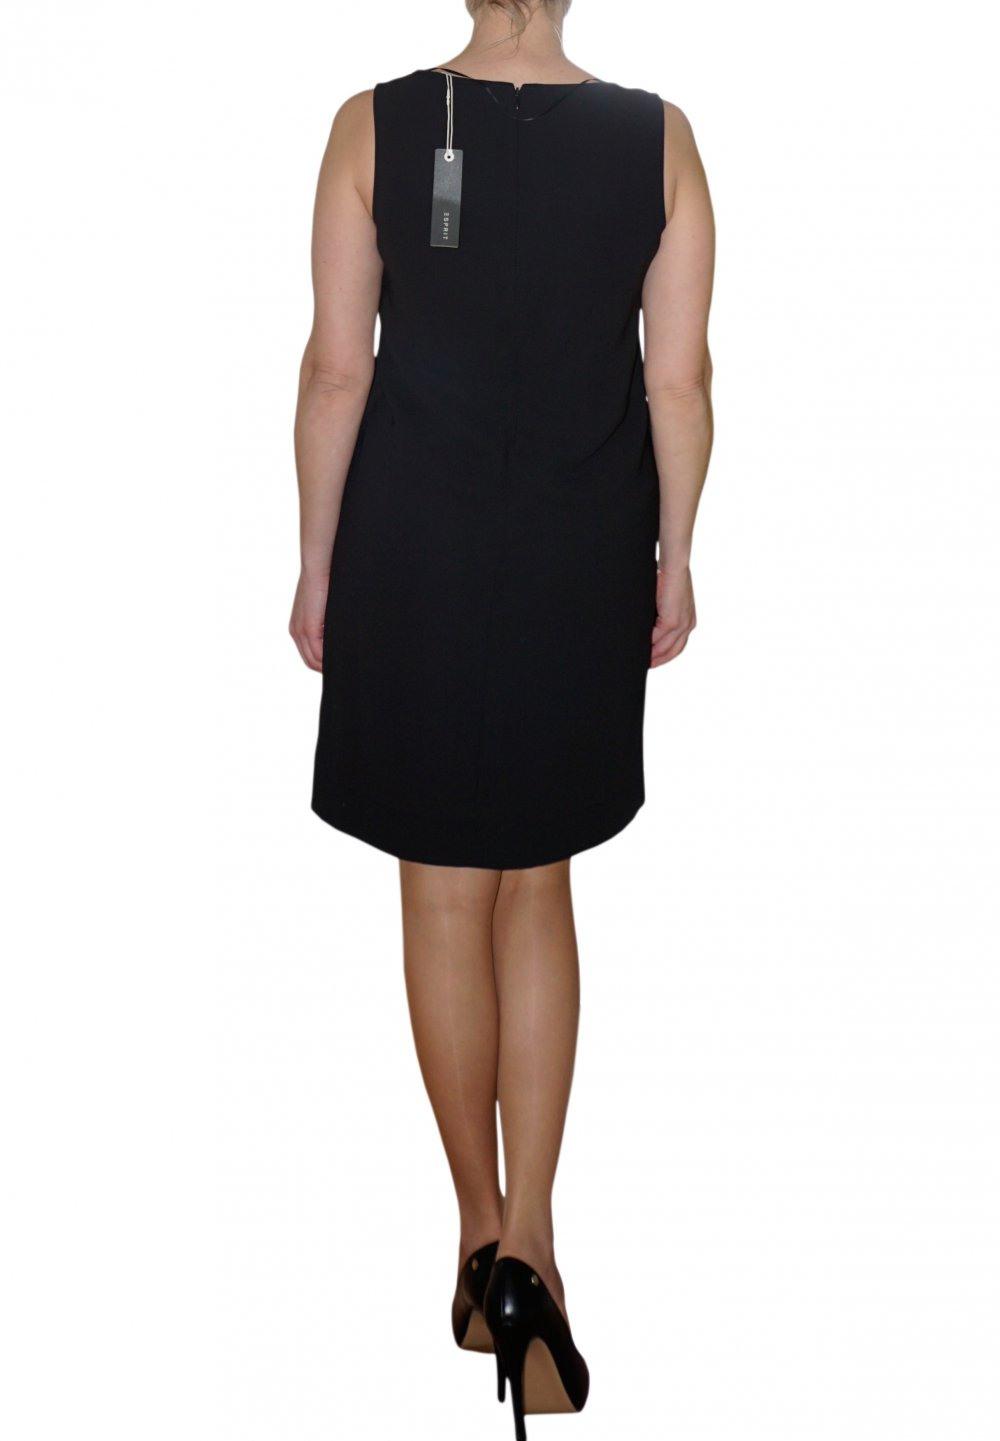 Esprit Kleid Party Sommerkleid Cocktail Abendkleid Gr S